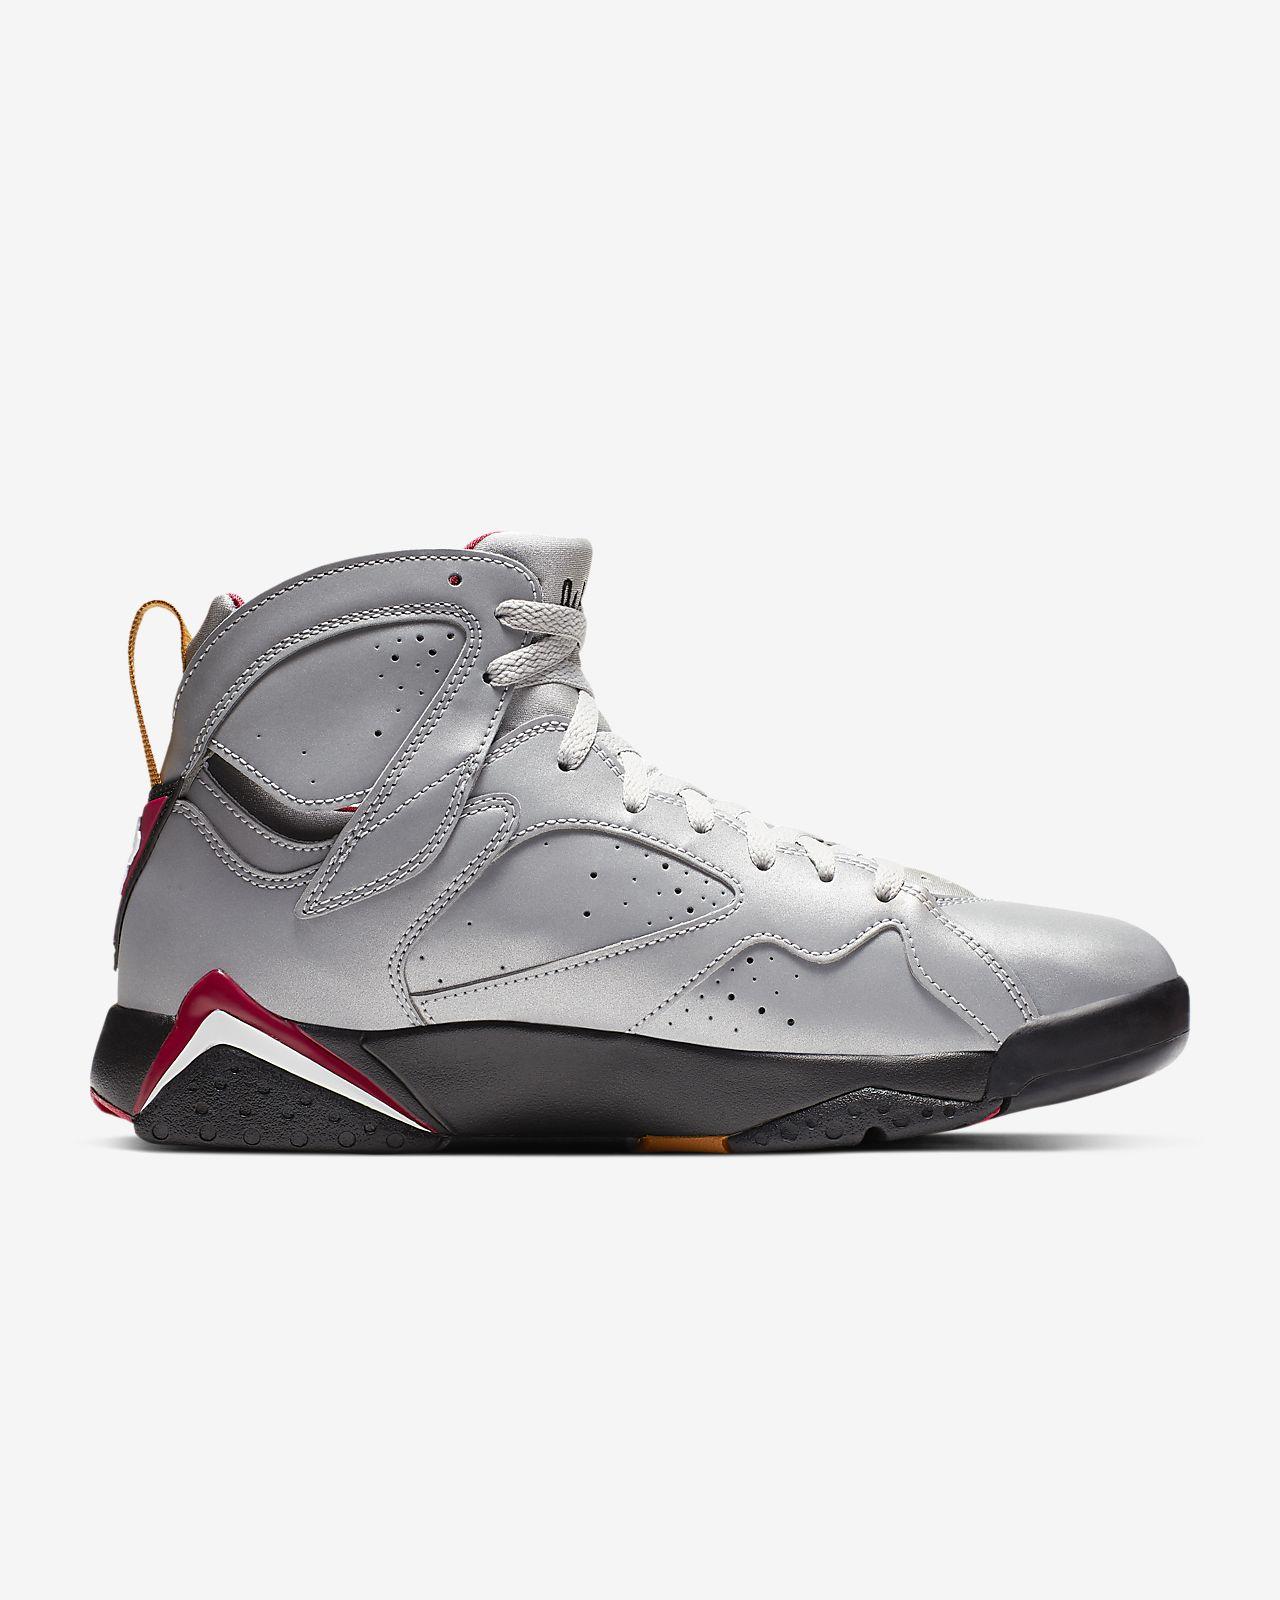 Air Jordan 7 Retro SP Men's Shoe